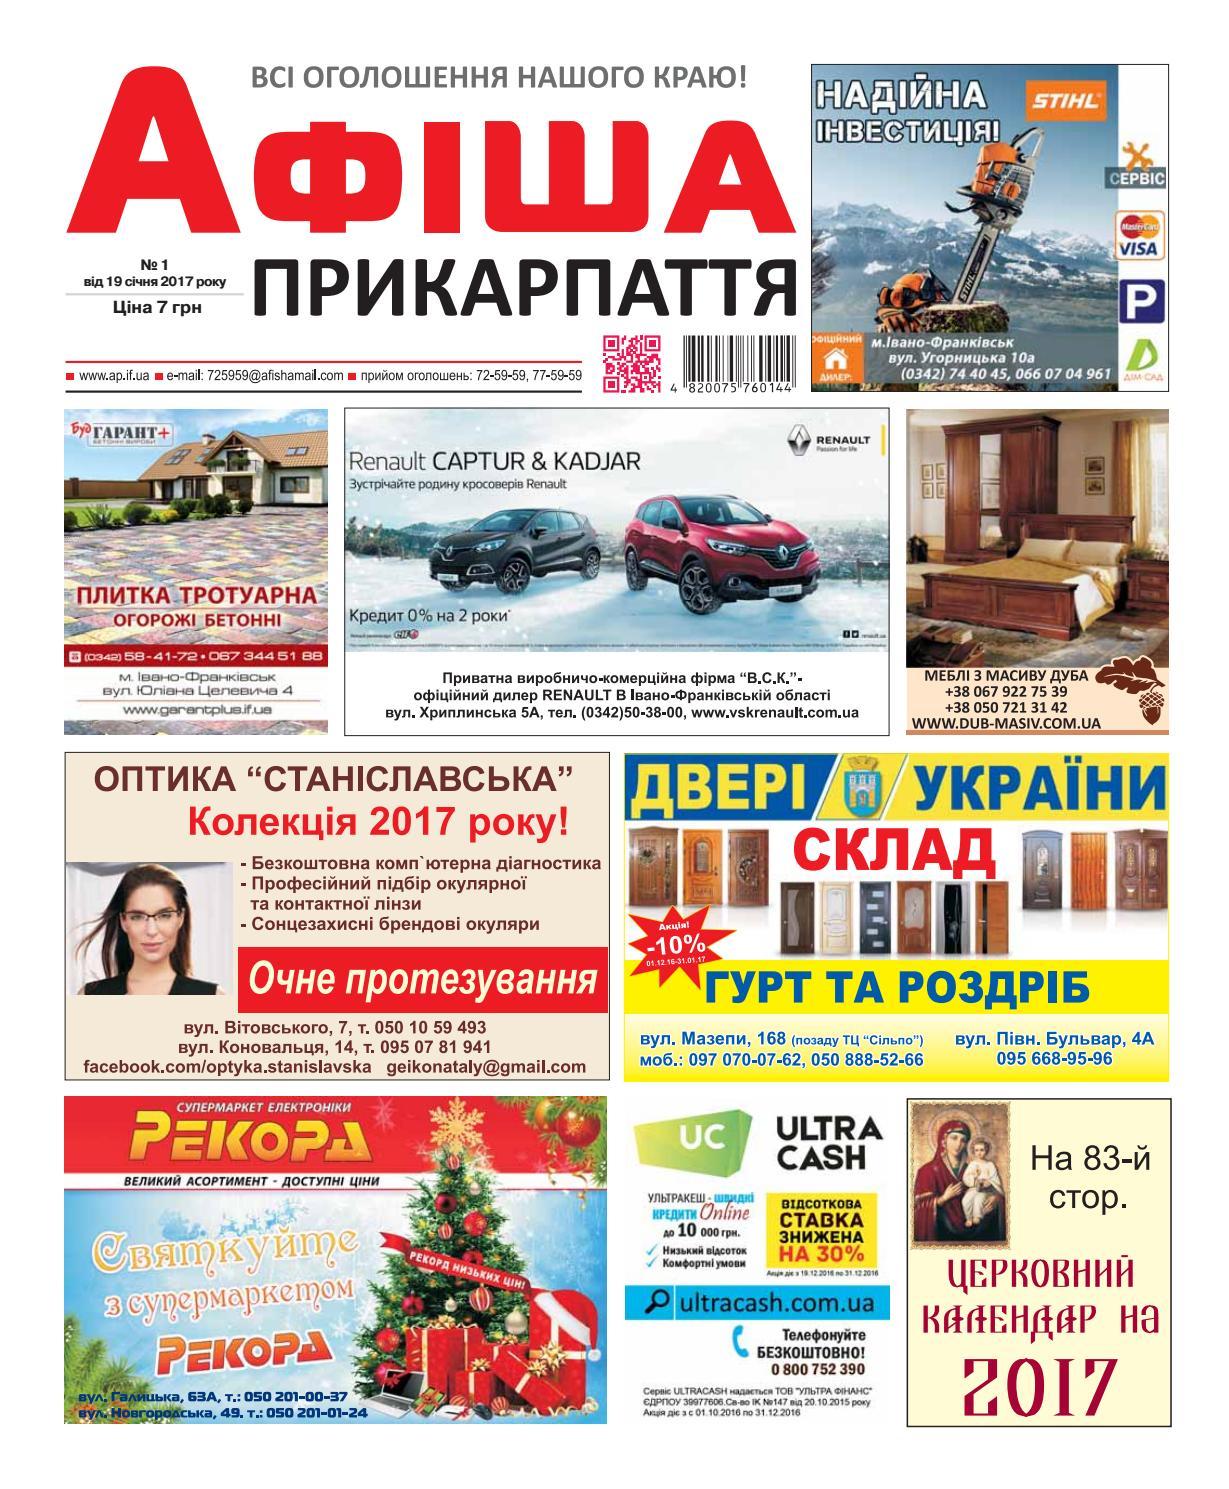 Афіша Прикарпаття №1 by Olya Olya - issuu f40b8800365ce